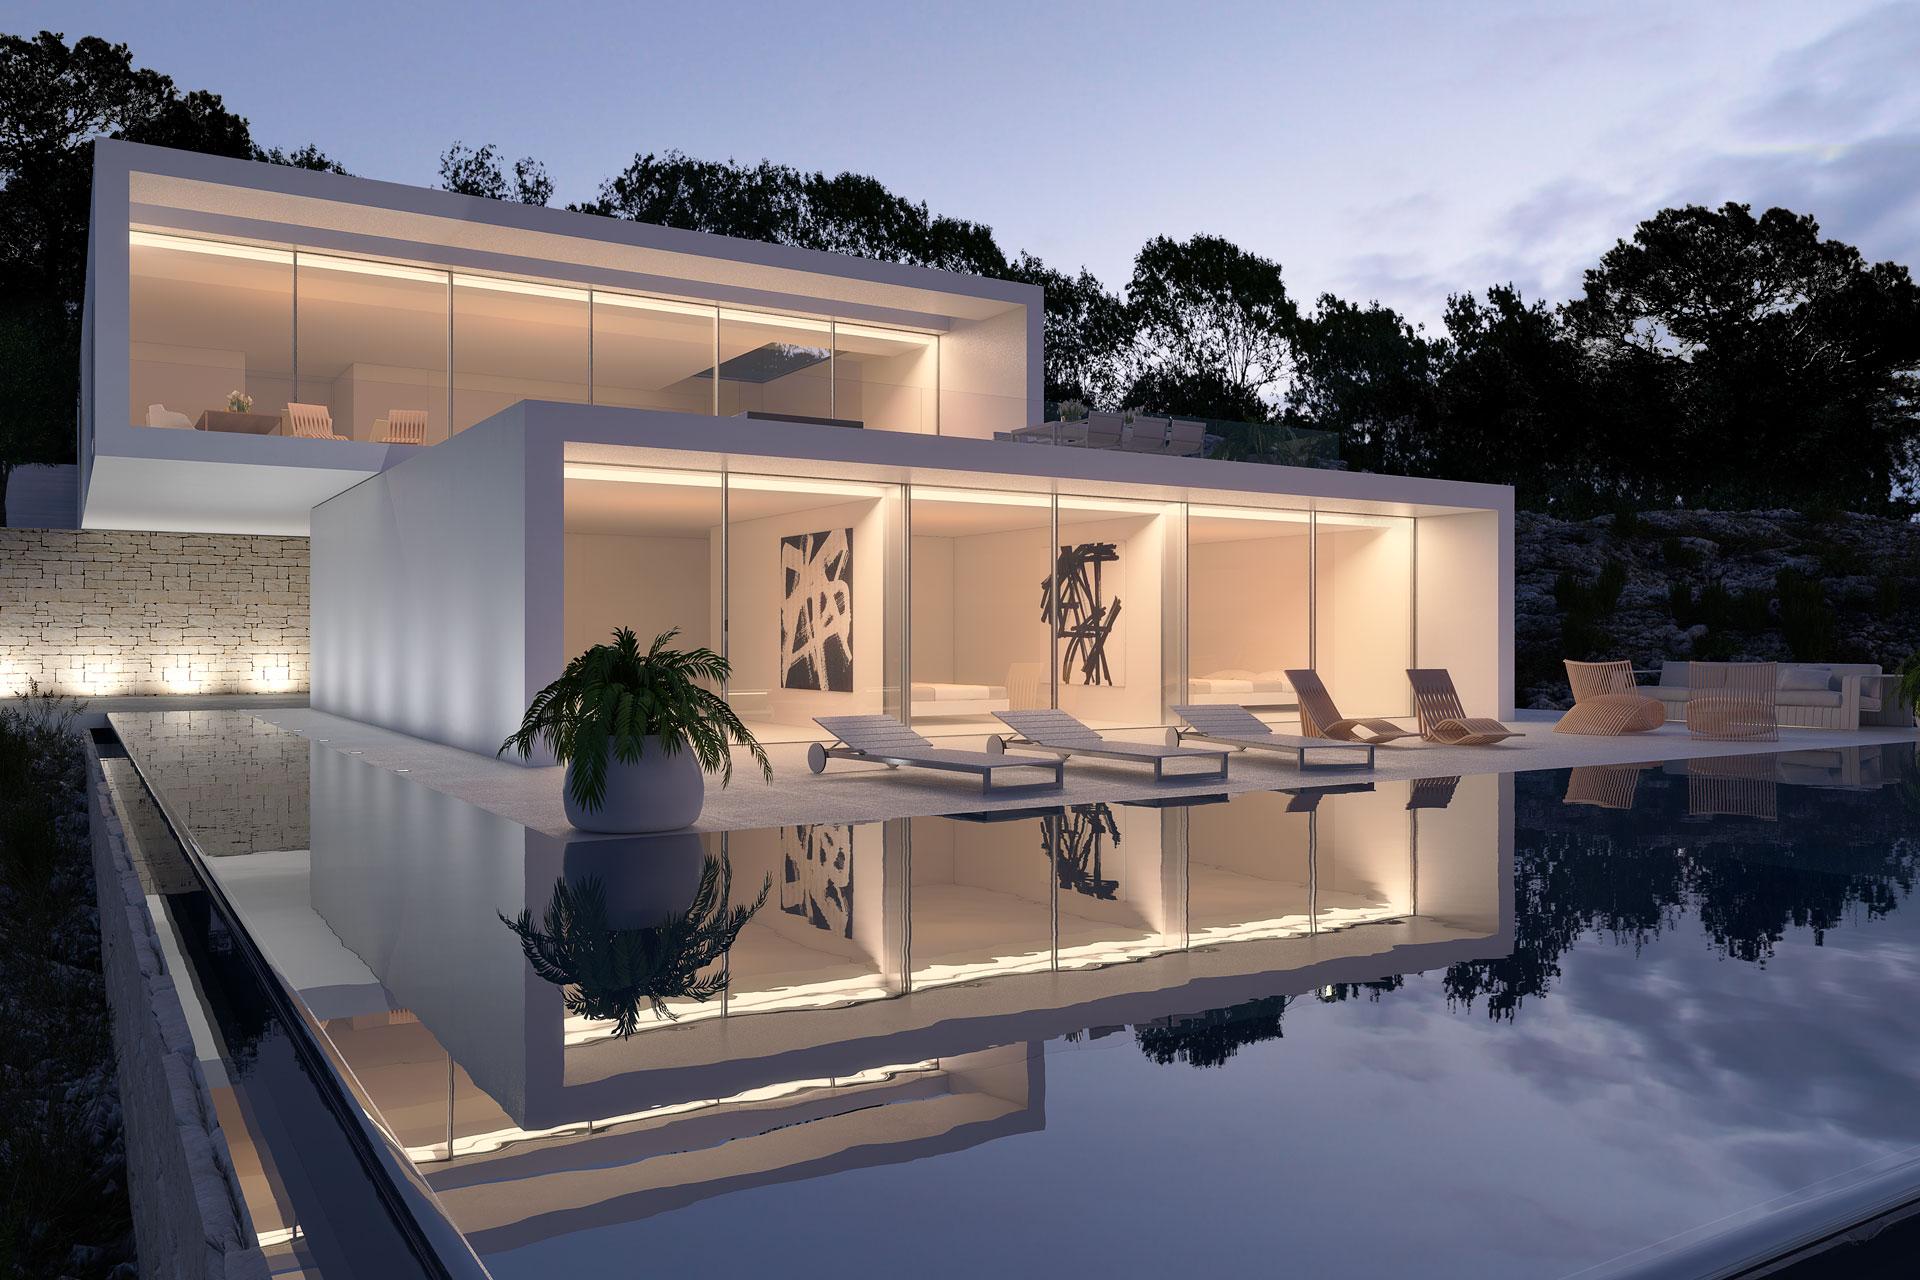 Tecnologia e Arquitetura / 3ve [Entrevista], © 3ve